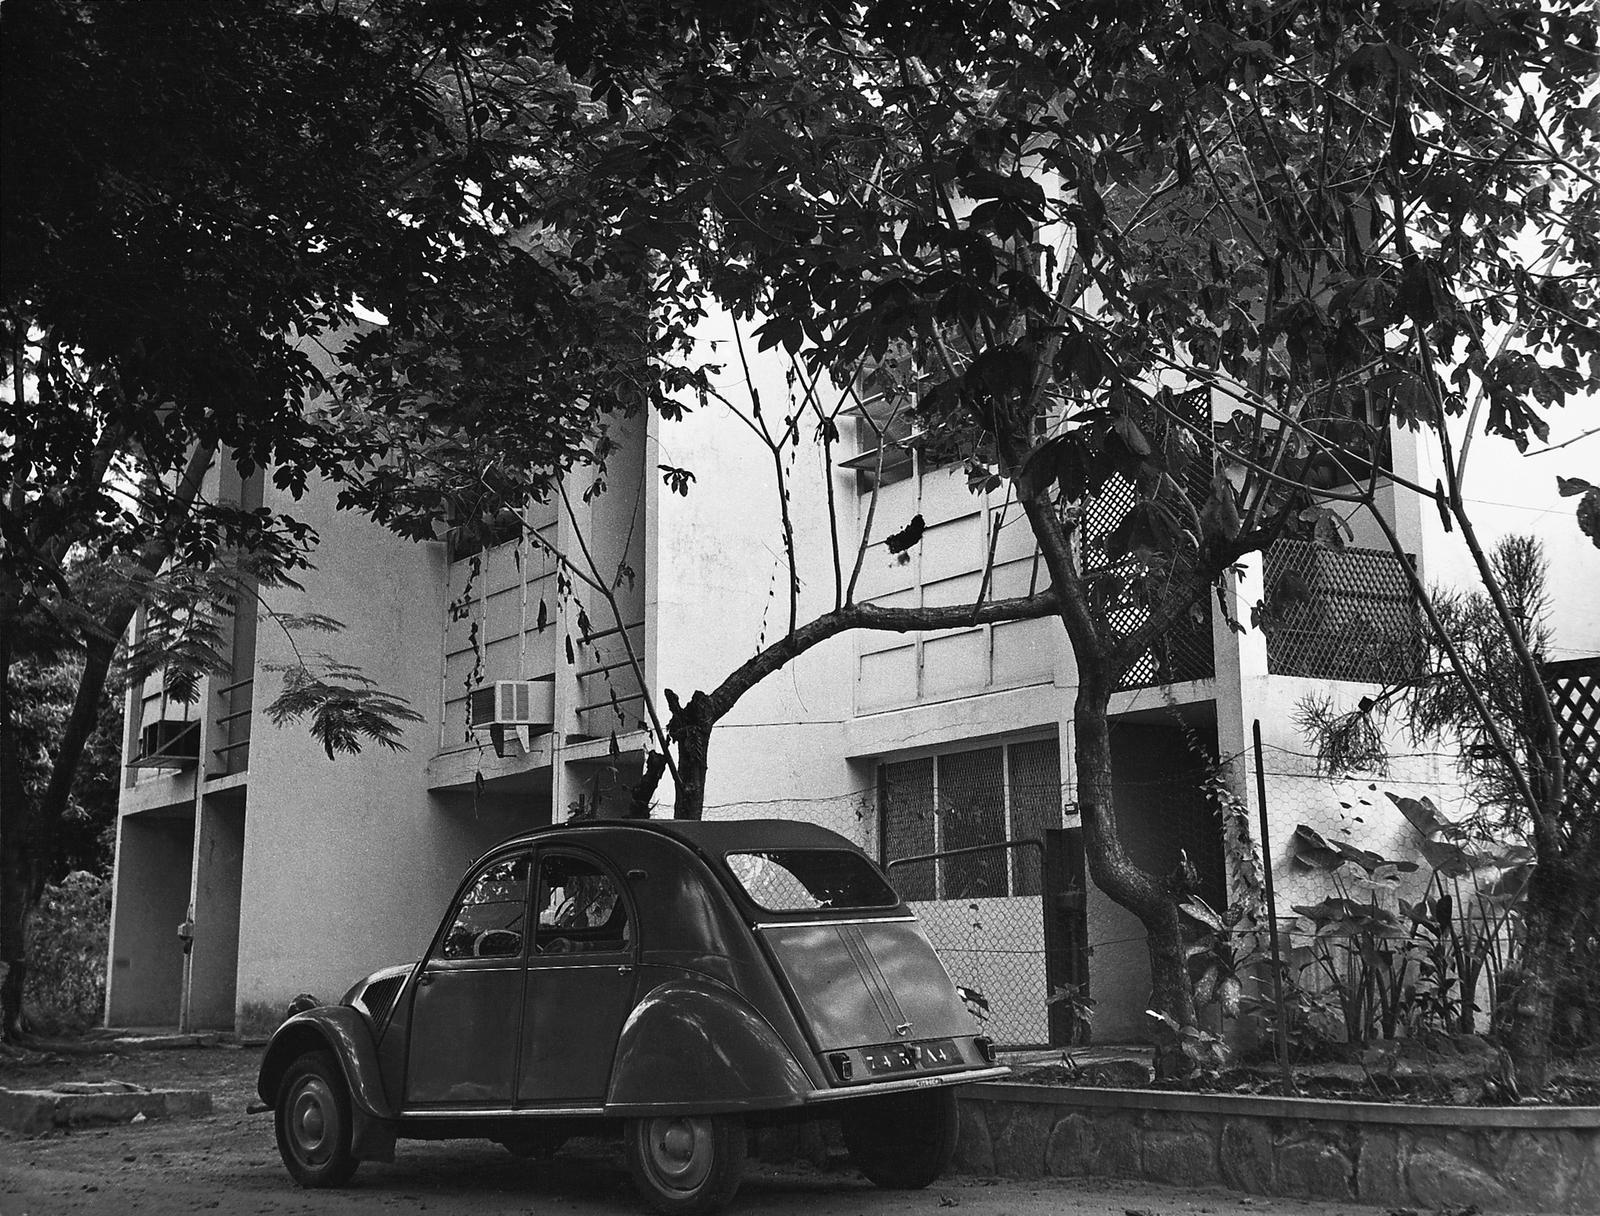 Brazzaville - Multi-Unit Residential Building - 1961